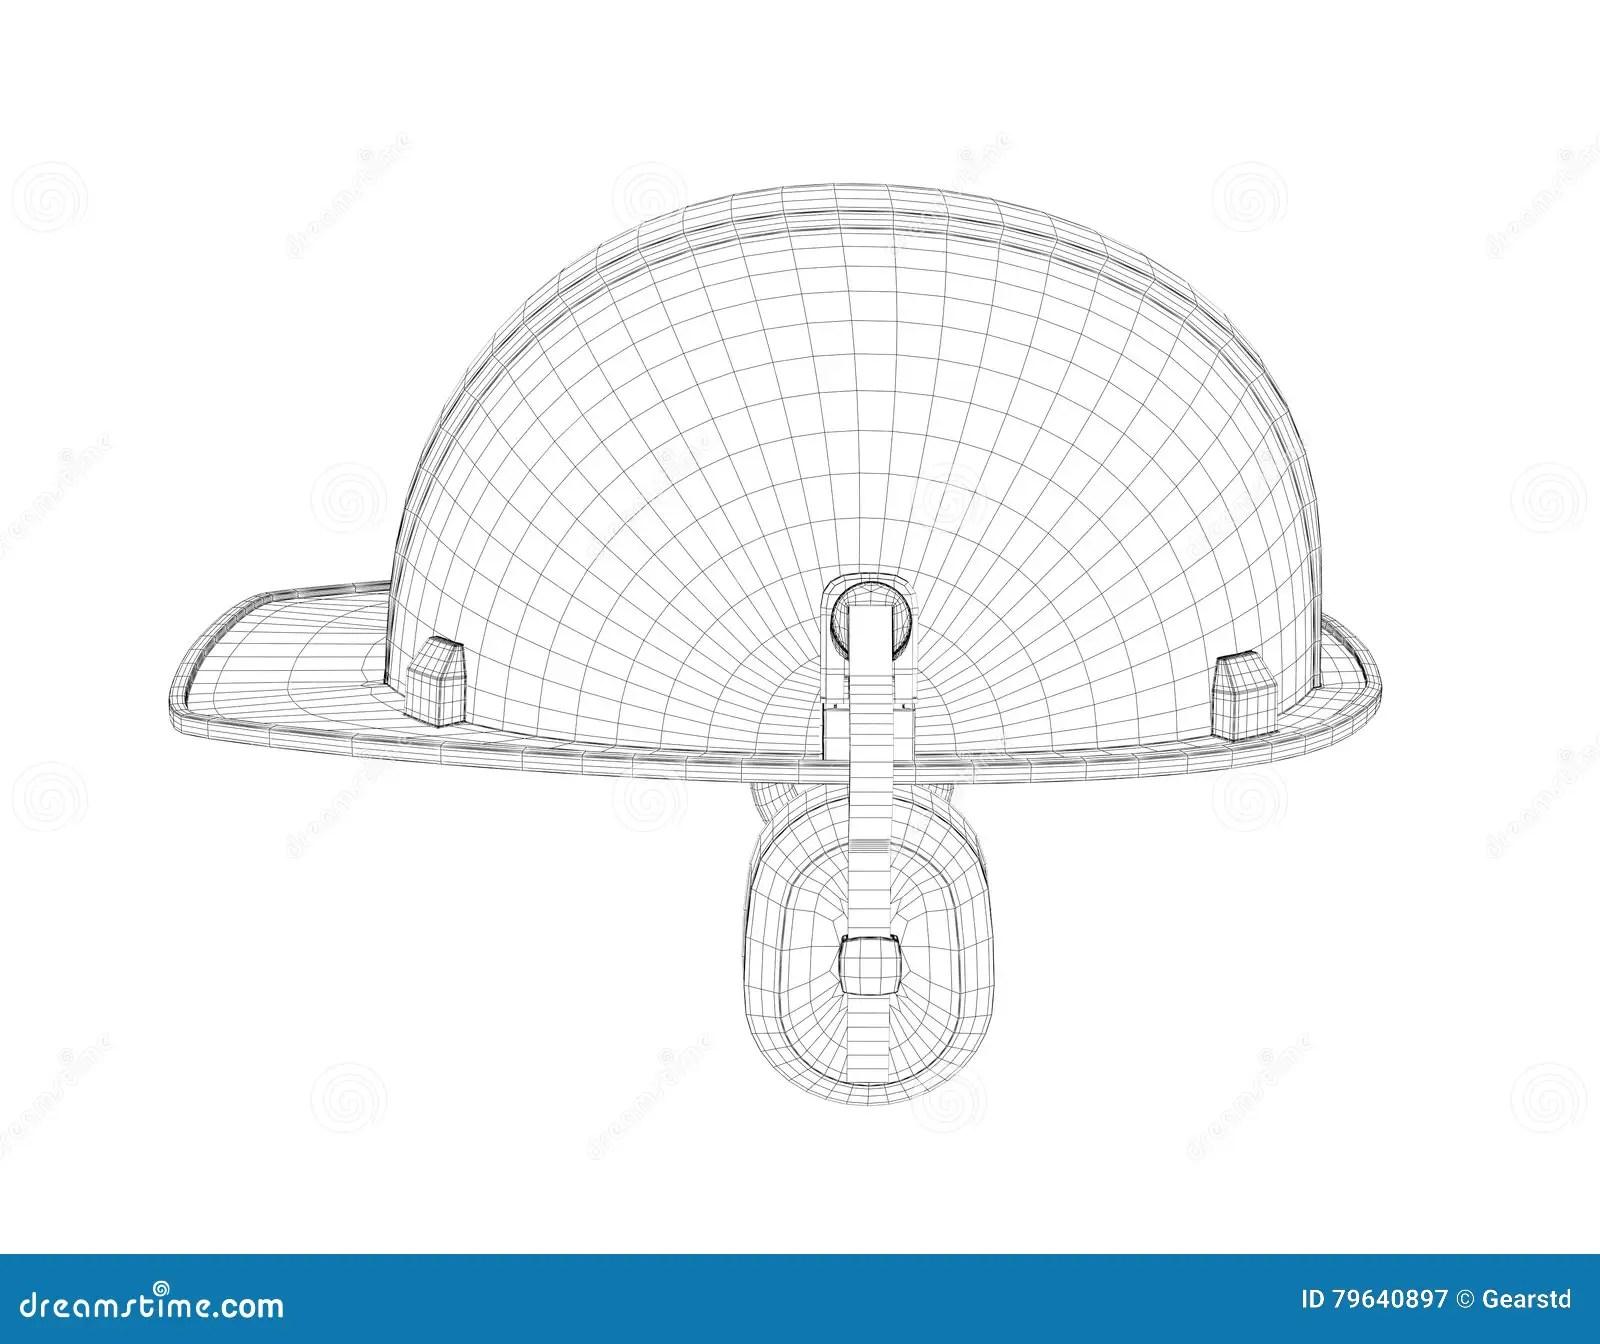 Wireframe Of 3d Model Safety Helmet With Earphones